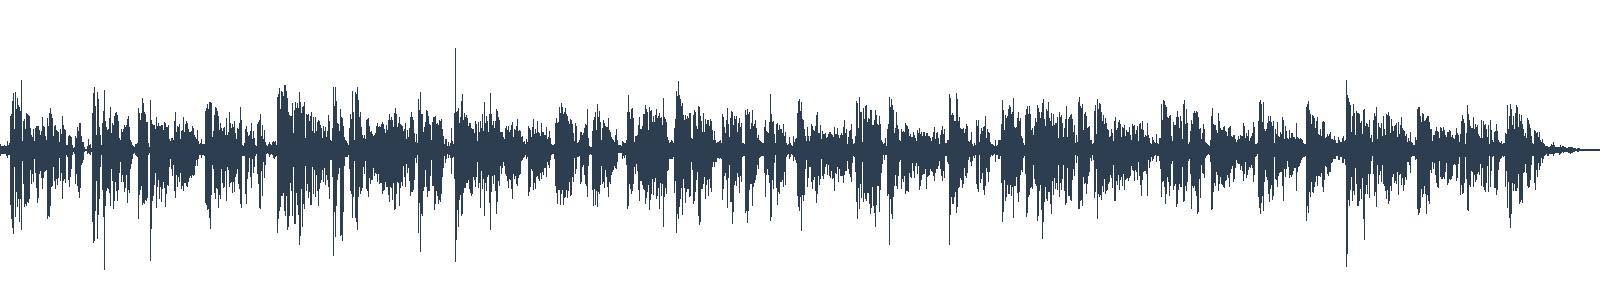 Nové audioknihy 11/2019 waveform